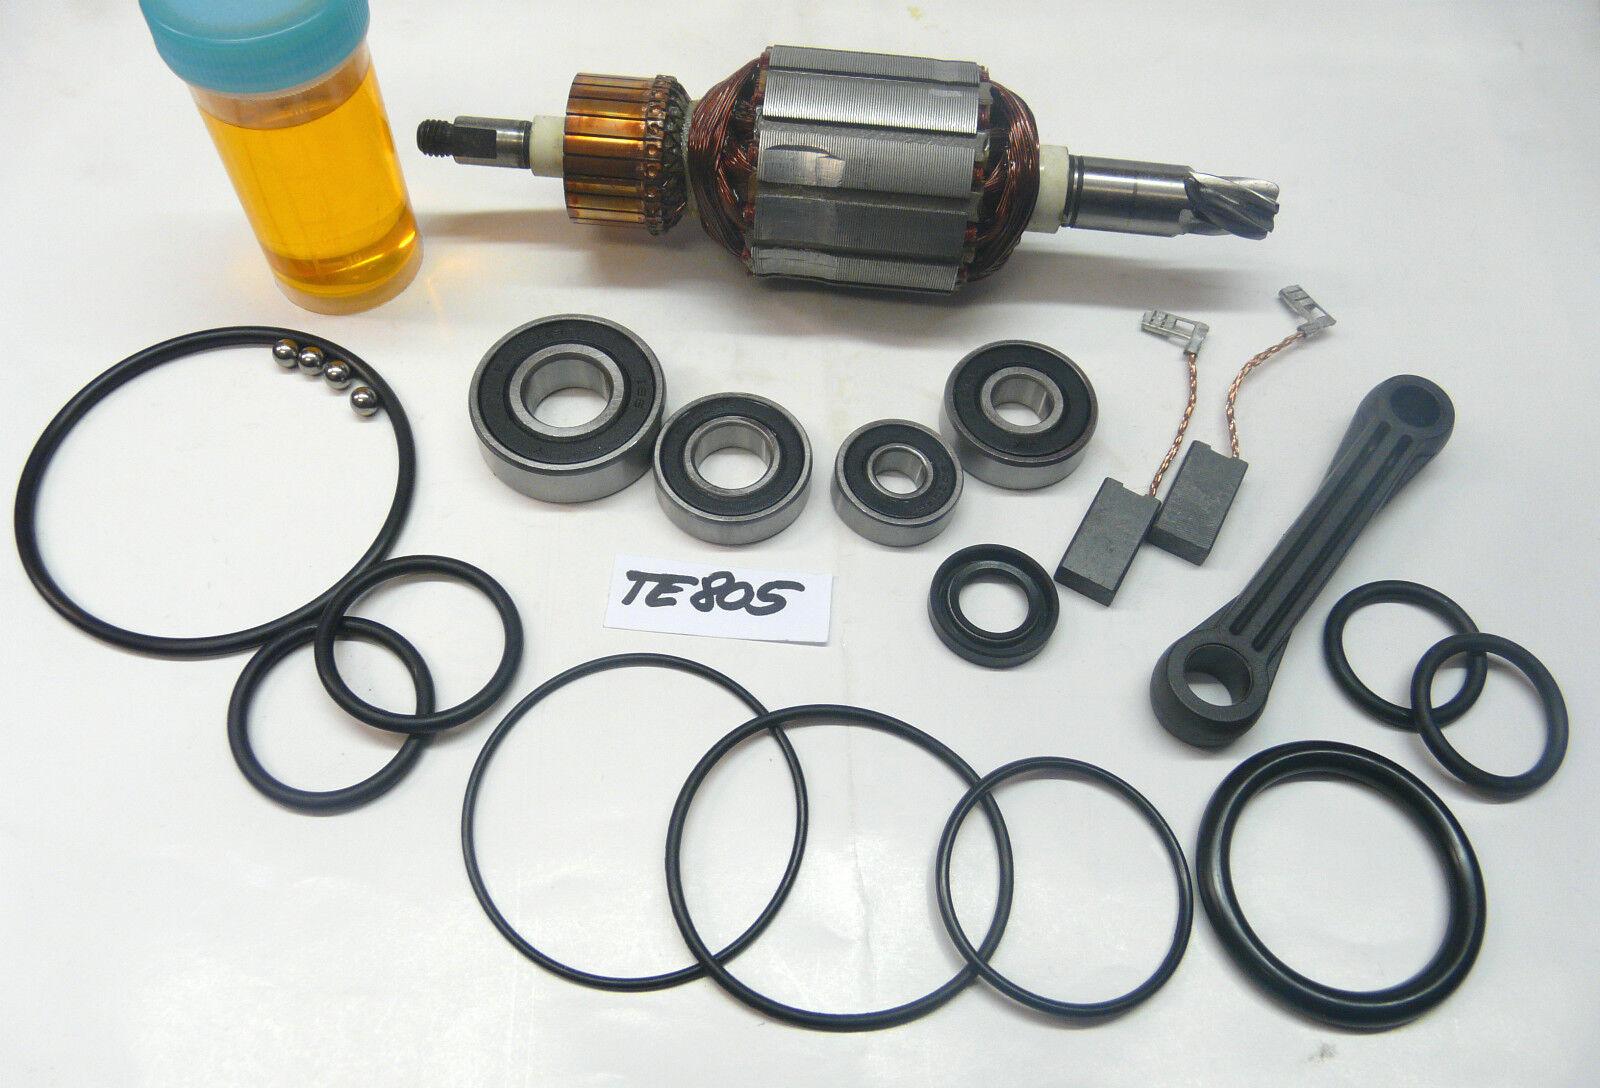 Hilti TE 805 Anker, Rotor mit Reparatursatz + Pleuel